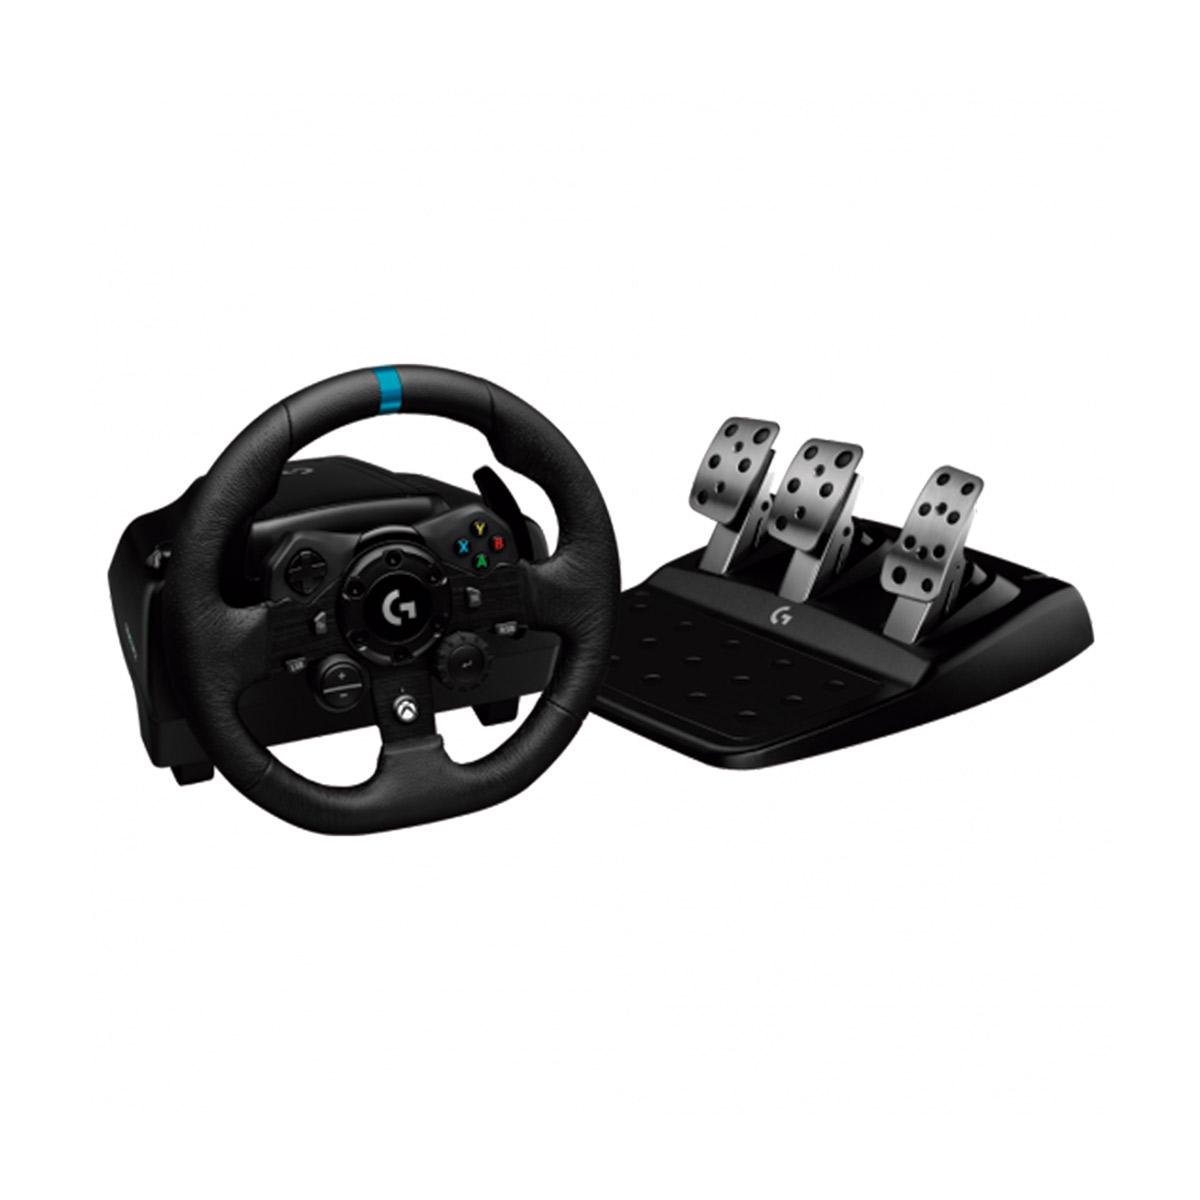 Volante Gamer Logitech G923 para Xbox SX, One, PC 941-000157